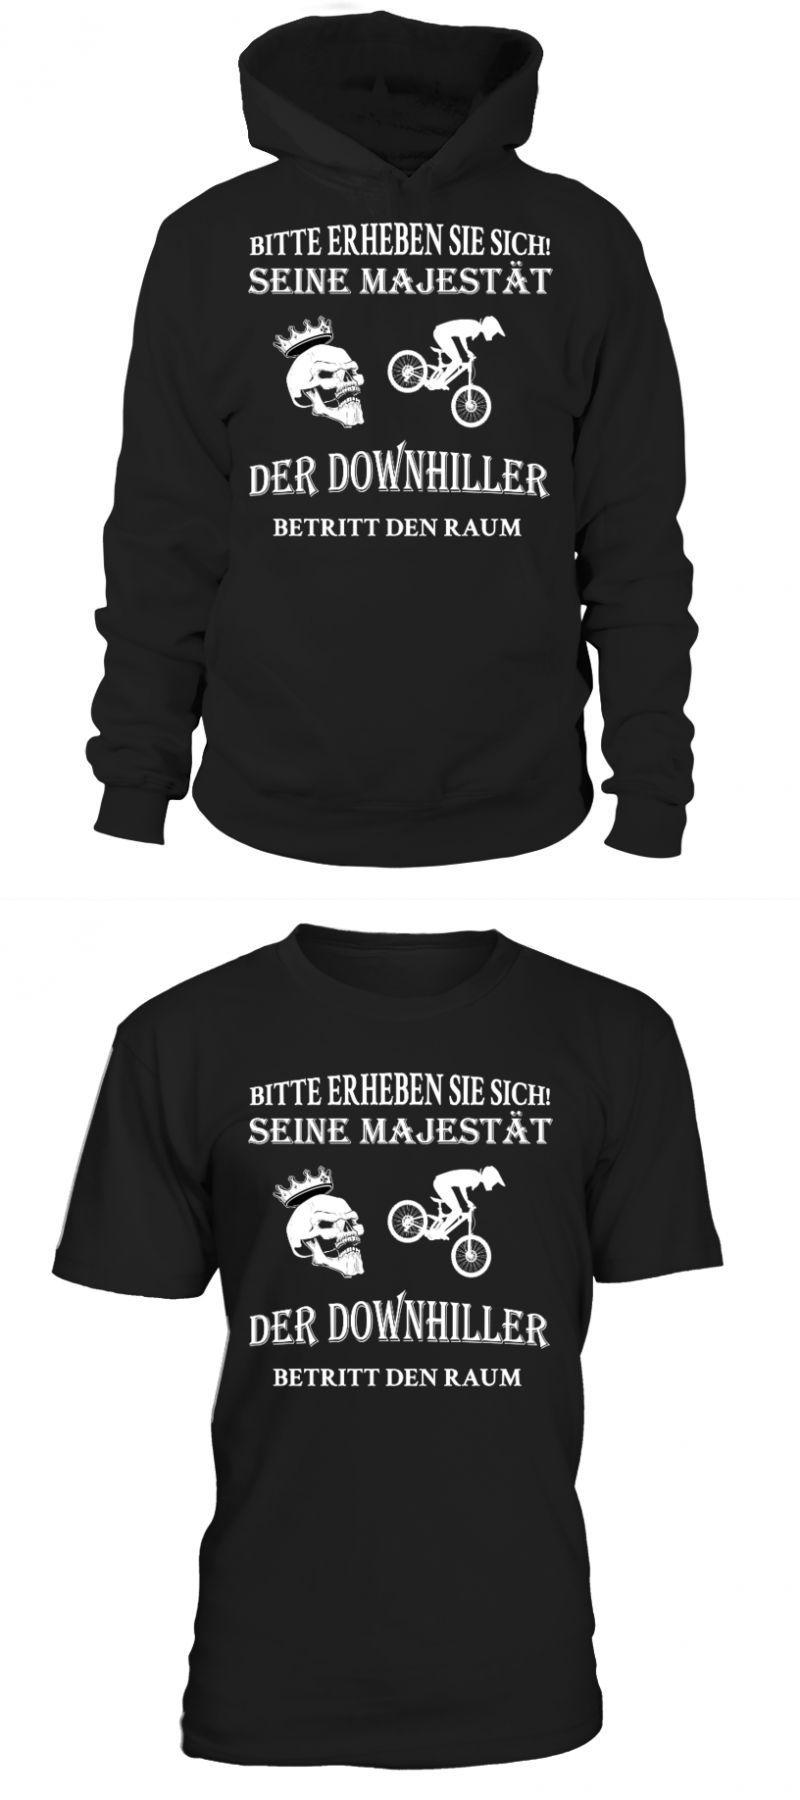 buy popular bbd0b dba7d T-shirt sport vector downhill majestÄt - nur noch 2 tage tee shirt sport nike  femme t-shirt sport vector downhill majestÄt nur noch tage tee  shirt ...